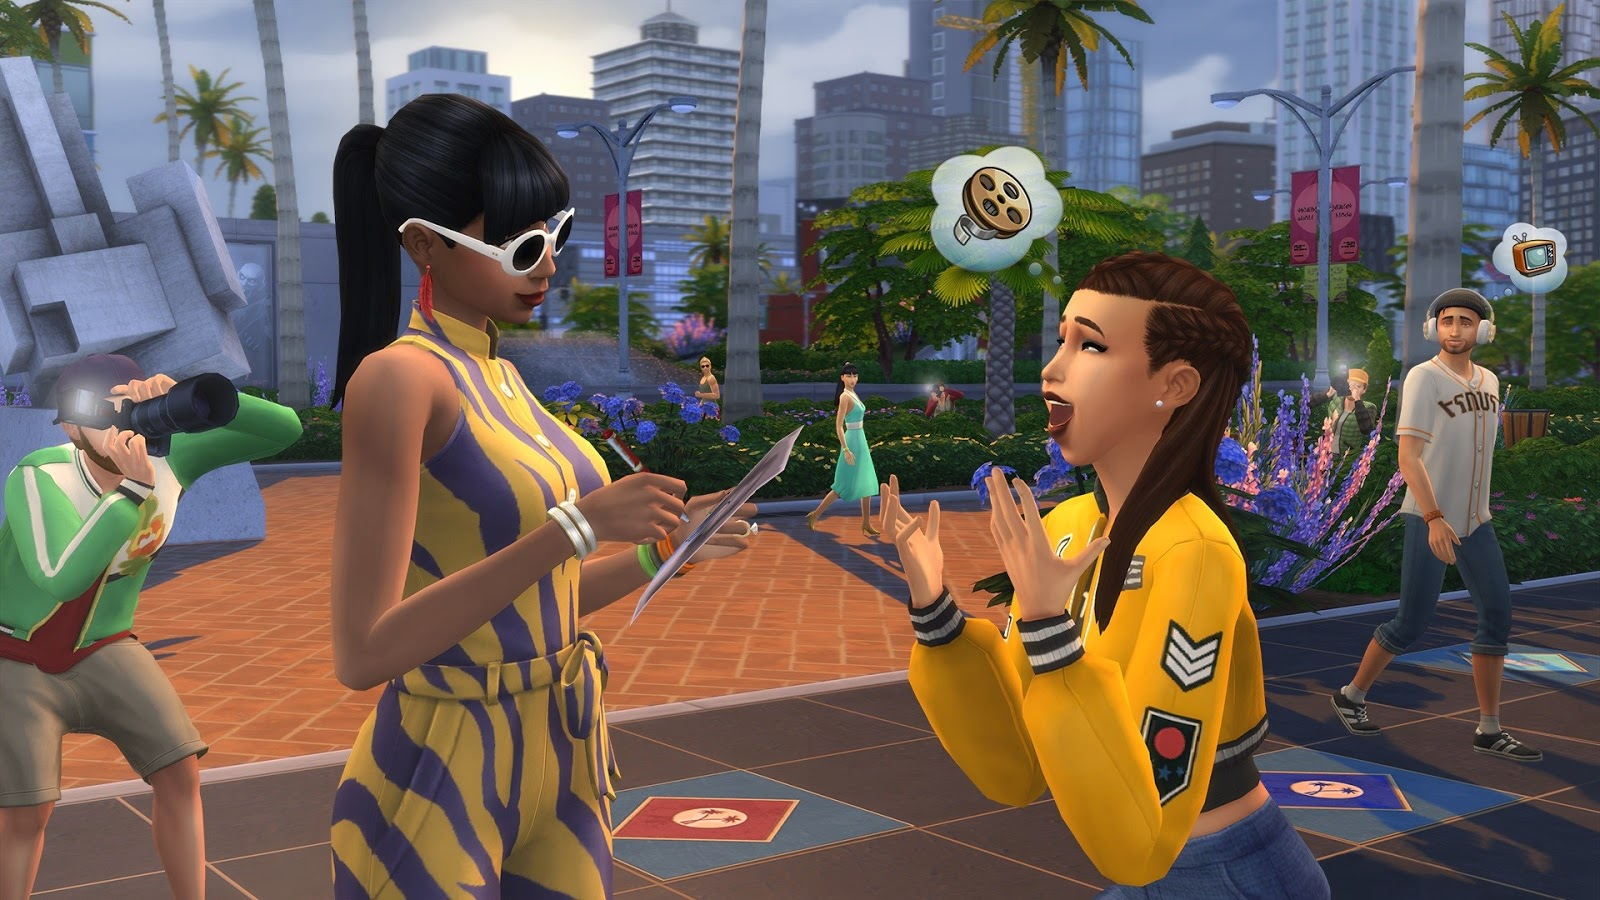 Los Sims 4 Rumbo A La Fama PC ESPAÑOL + Updates (CODEX) 1